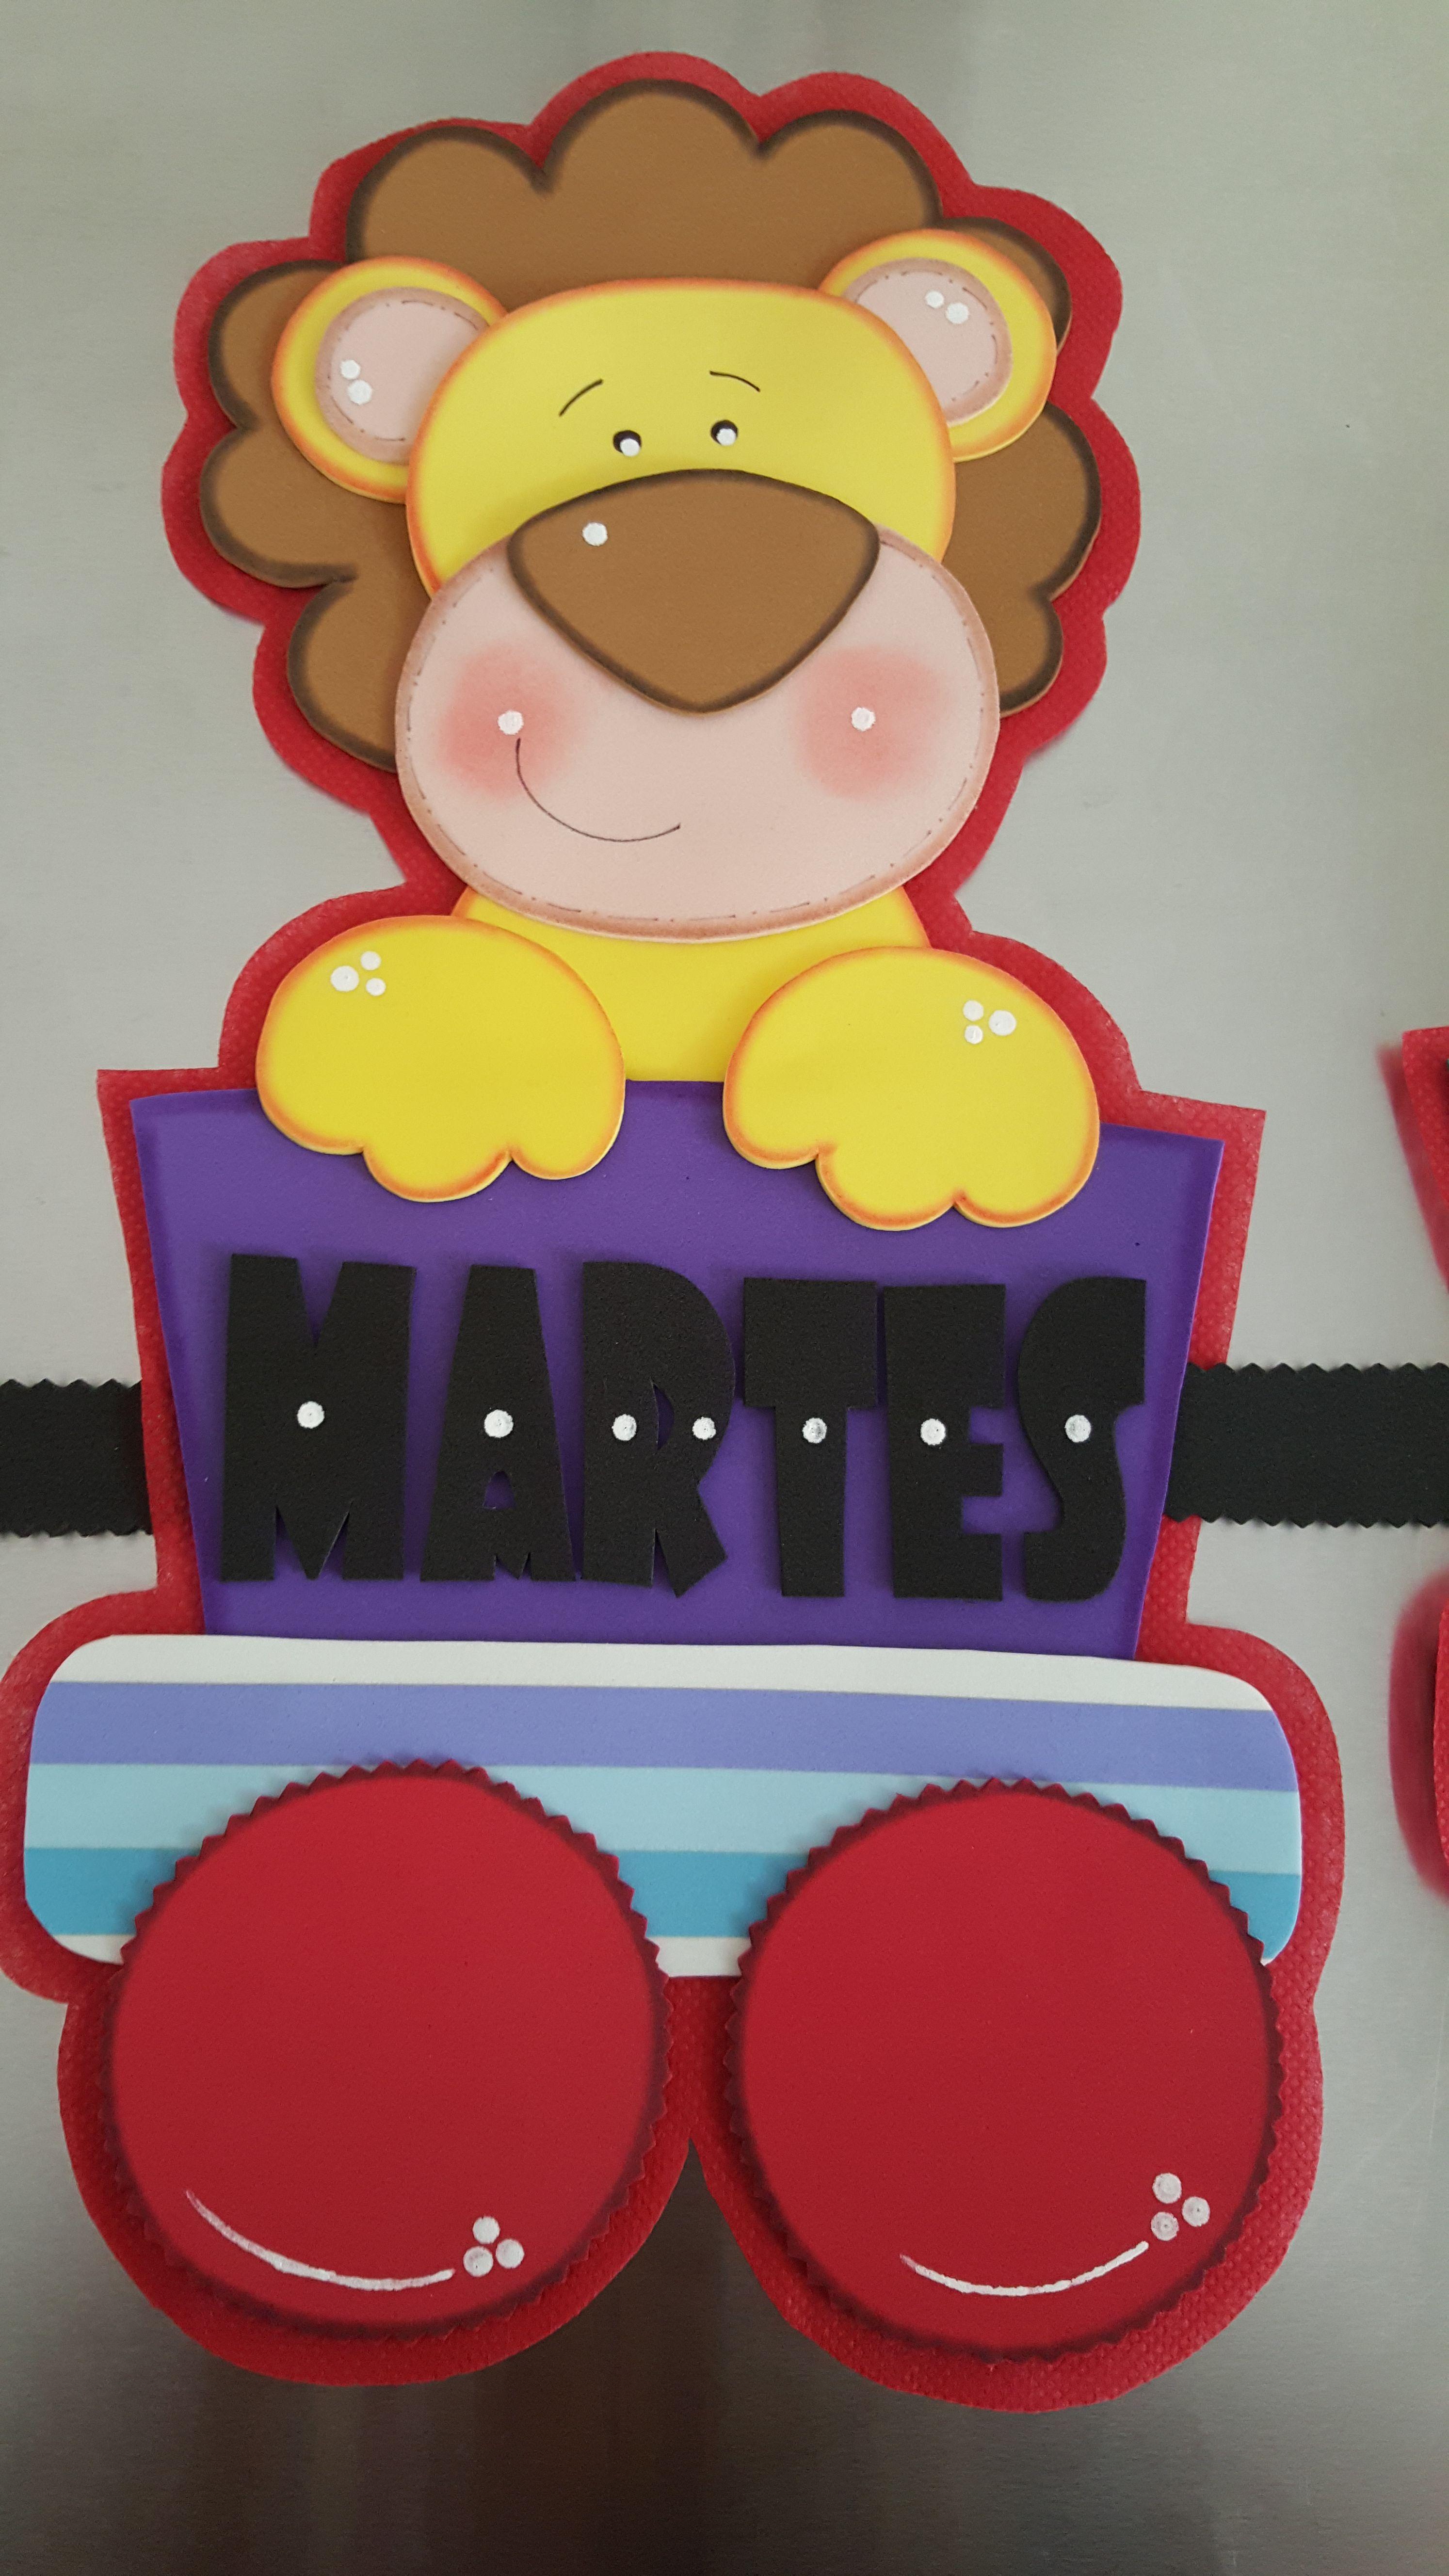 Días De La Semana Manualidades Escolares Decoraciones Escolares Decoración Aula De Preescolar